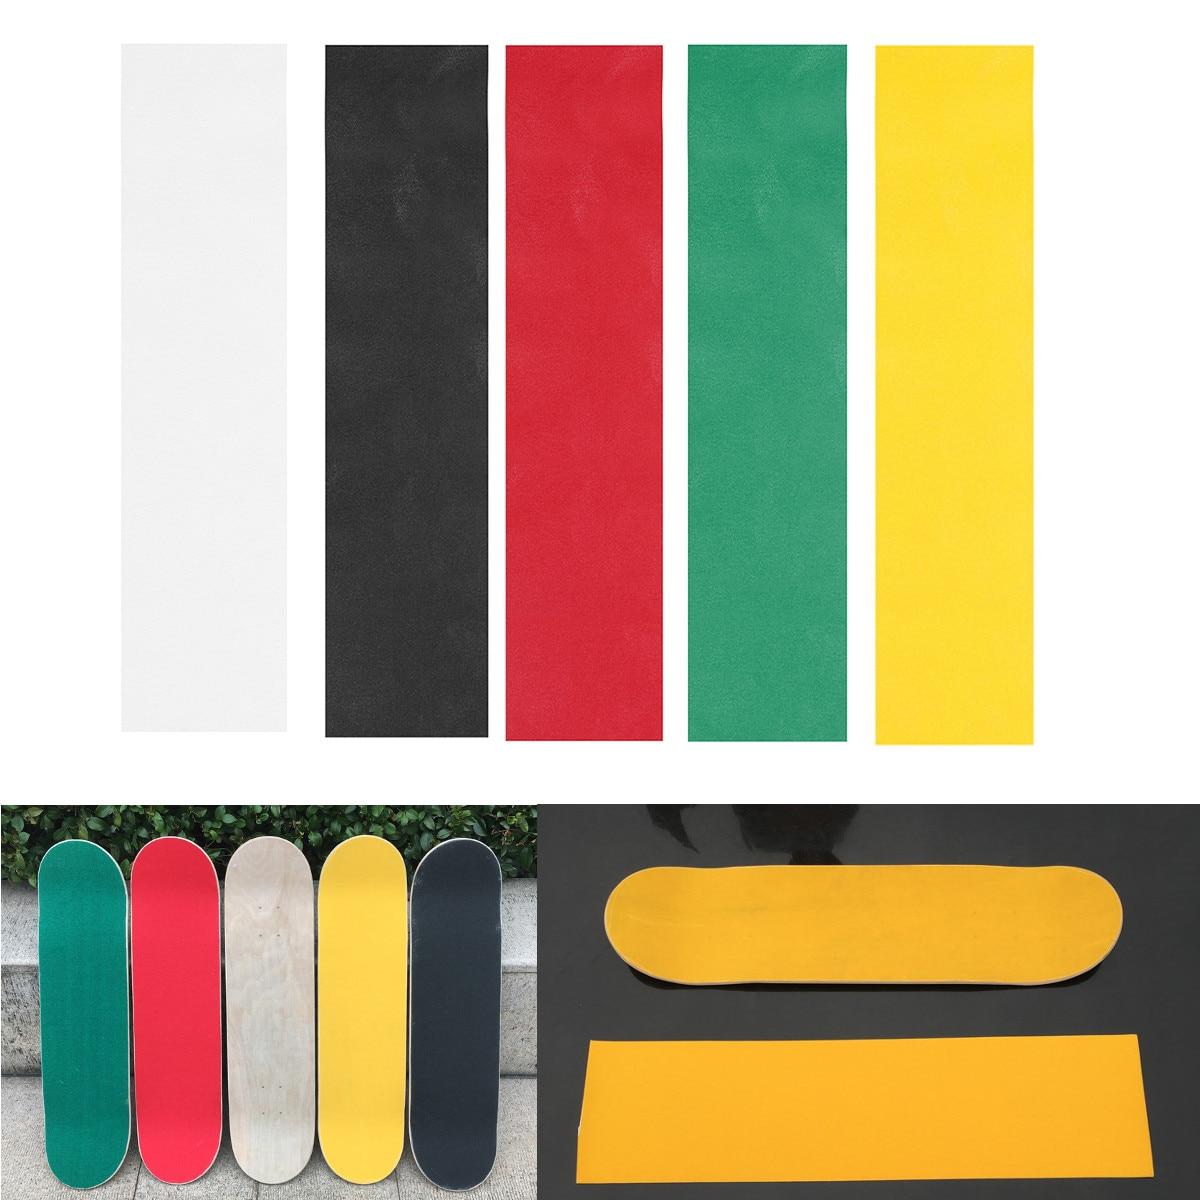 Professional Skateboard Deck Sandpaper Grip Tape Griptape Skating Board Sticker Longboard Accessories 32''x9'' 80X23cm 5 Colors